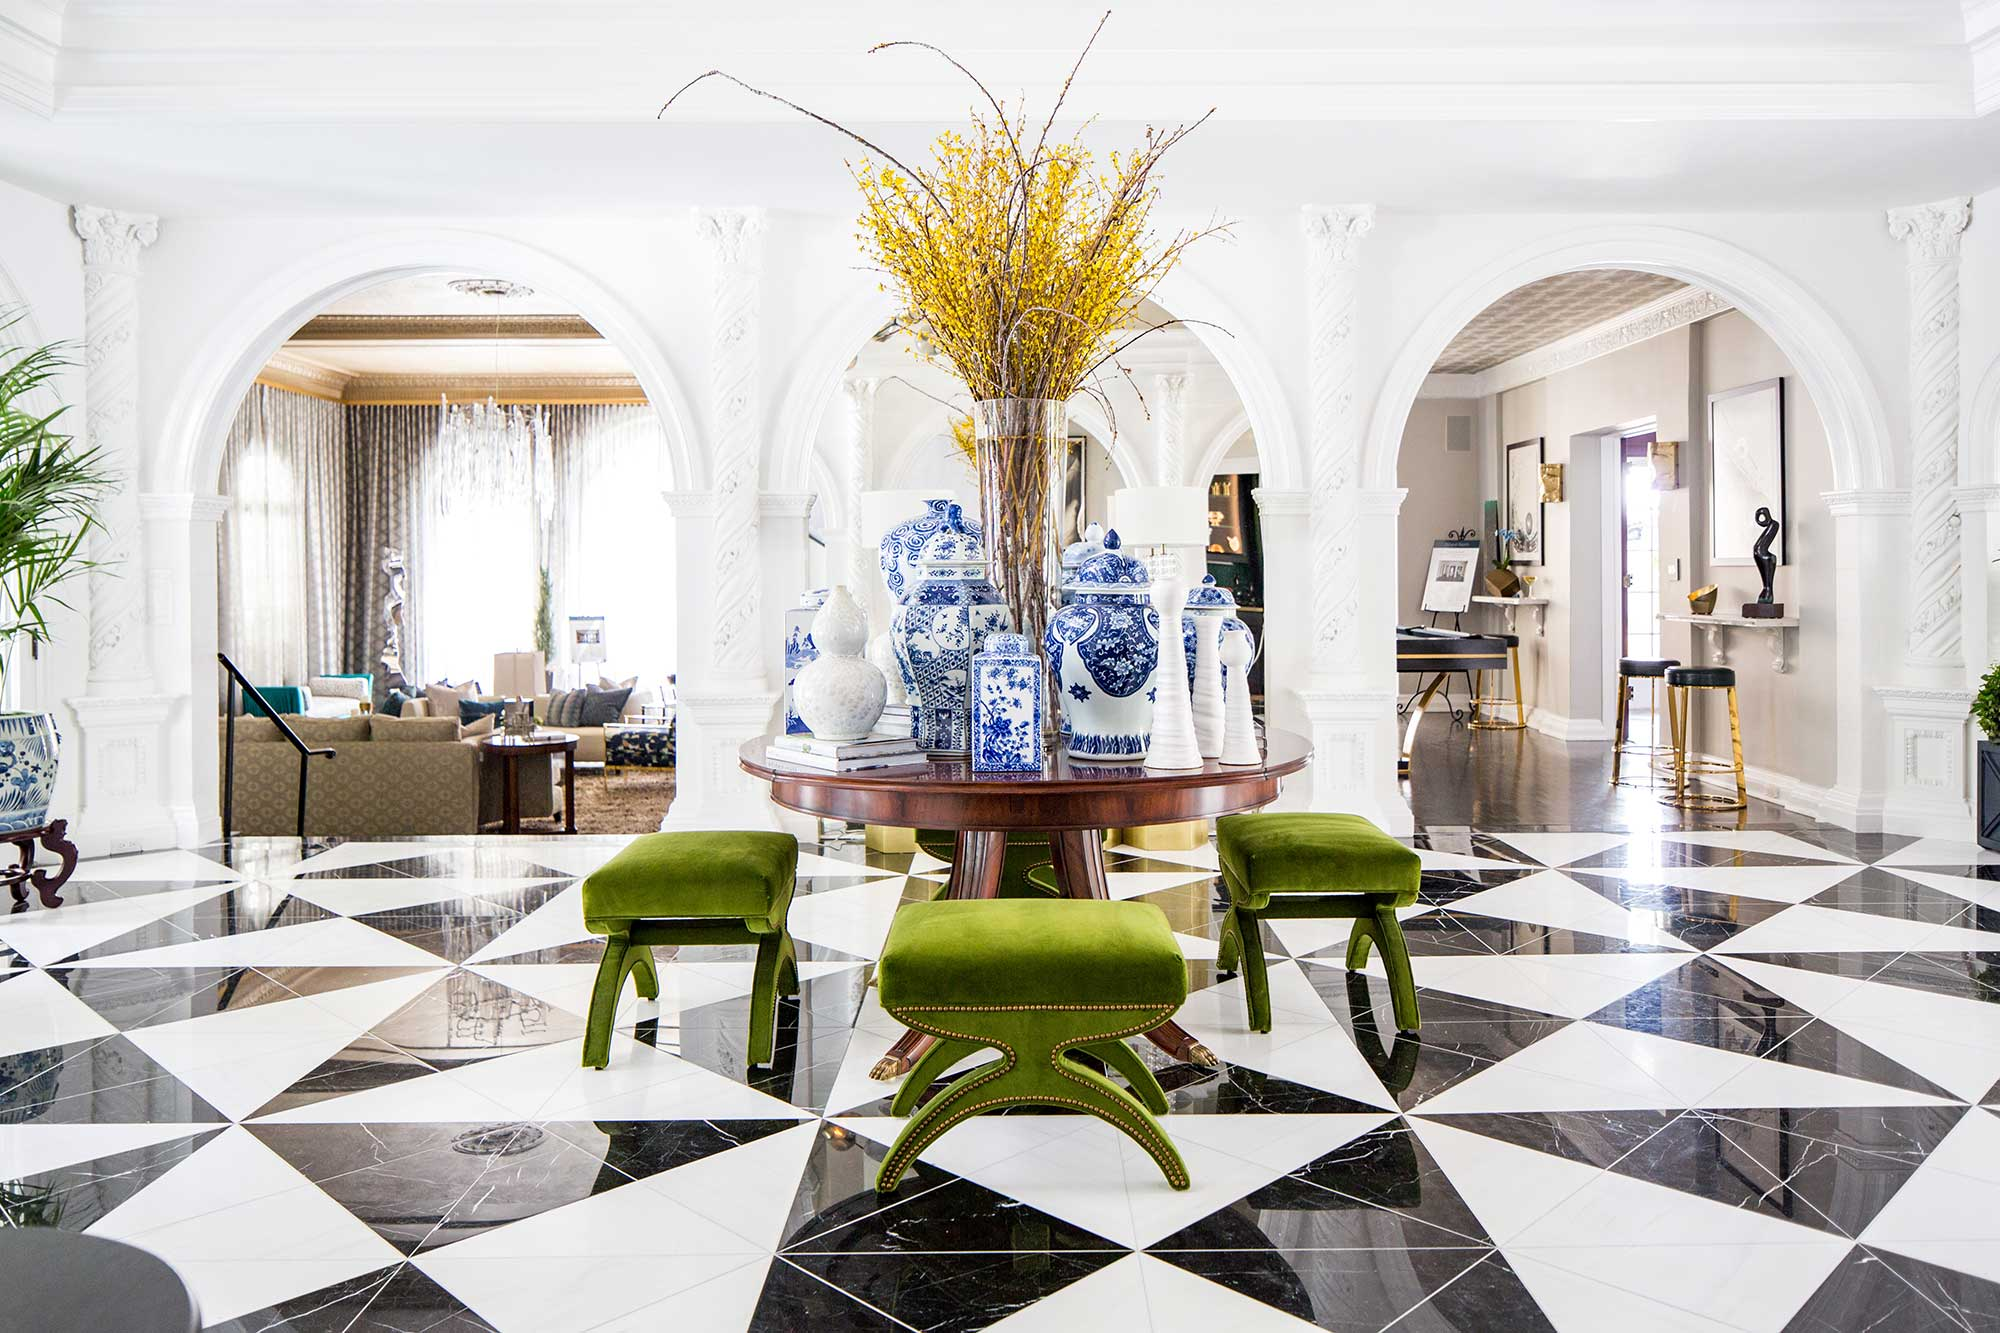 2018 Pasadena Showcase House Of Design Grand Foyer